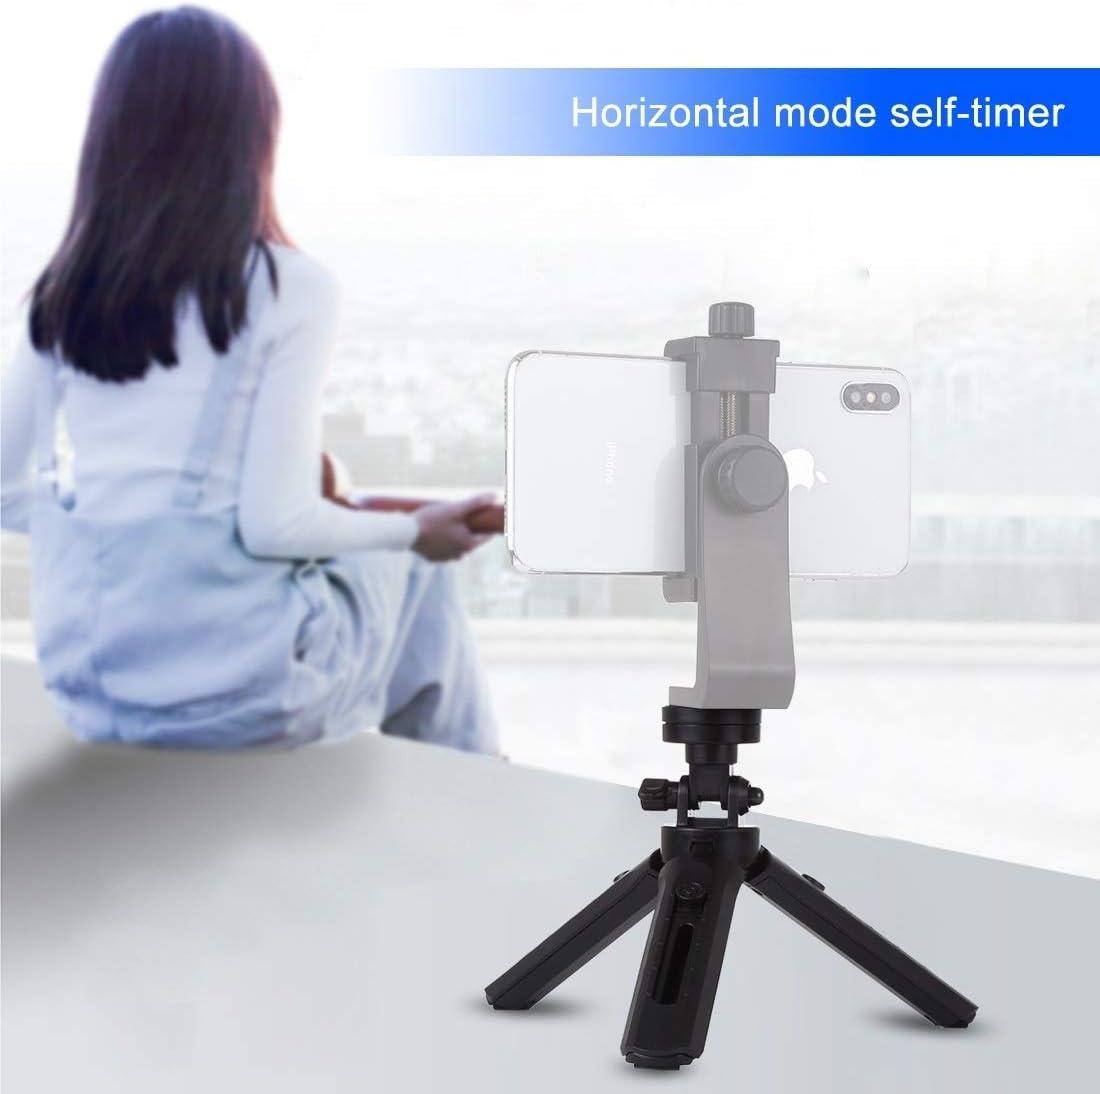 Adjustable Height 16.5-21.5cm CHENYANTUB Camera Accessories Pocket 5-Mode Adjustable Desktop Tripod Mount with 1//4 inch Screw for DSLR /& Digital Cameras